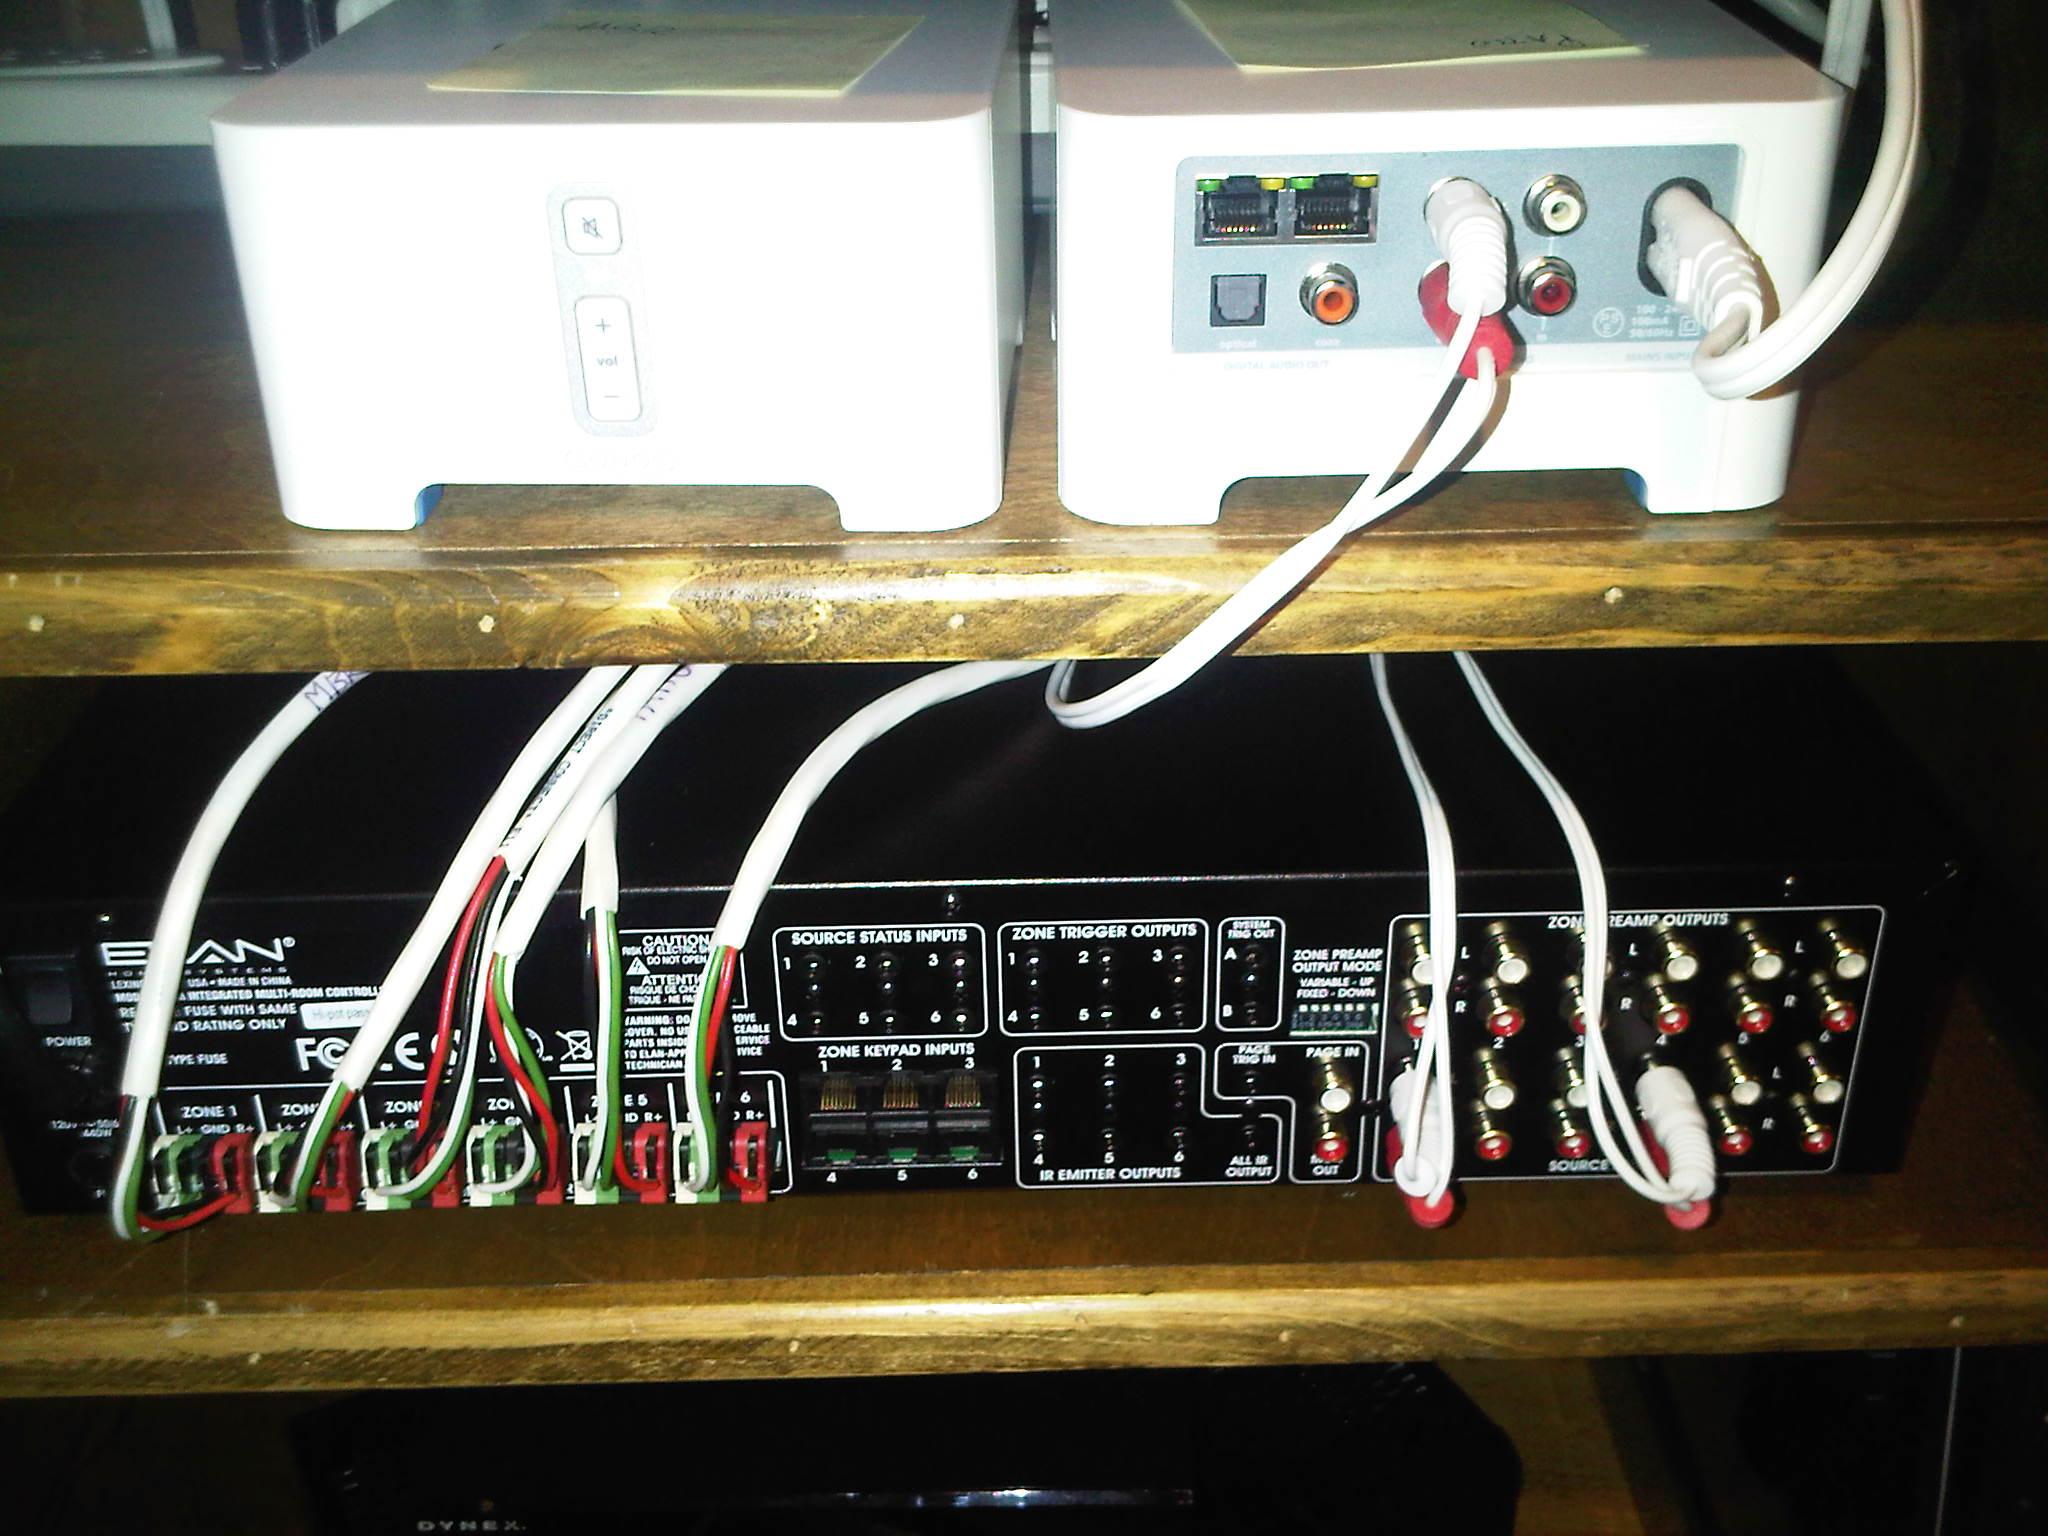 how do you program an elan s66a multi room controller i want. Black Bedroom Furniture Sets. Home Design Ideas